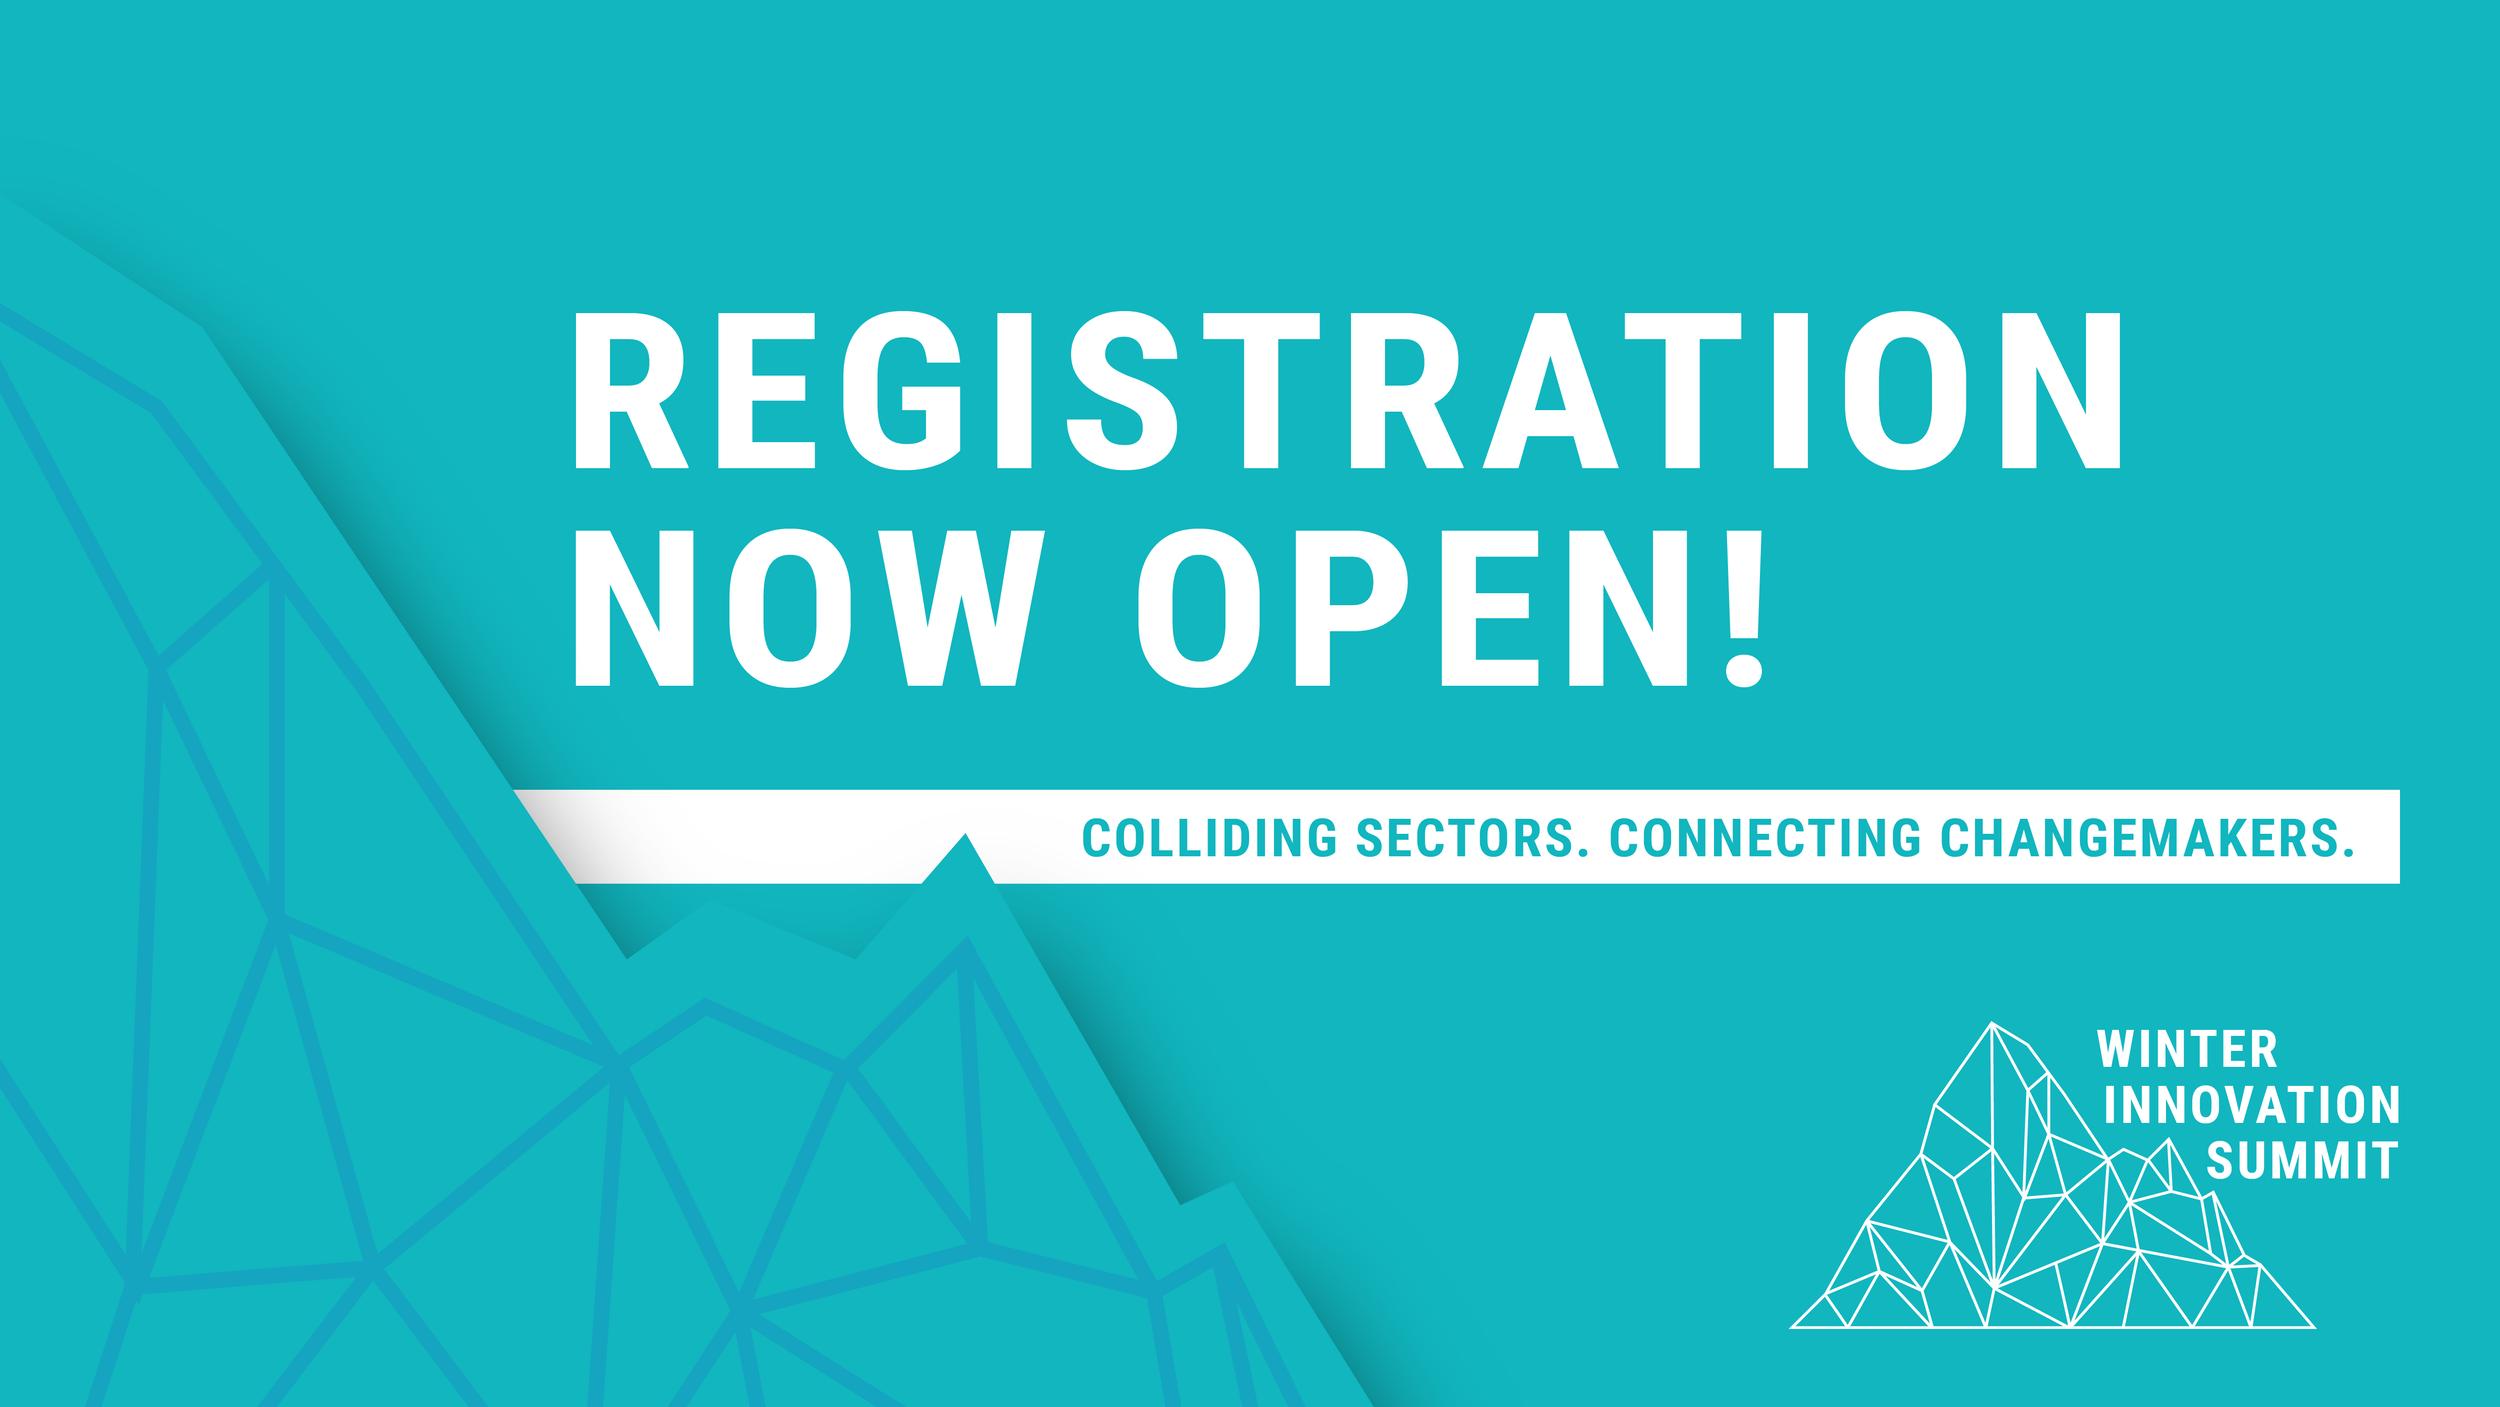 2020-winter-innovation-summit-registration-open.png